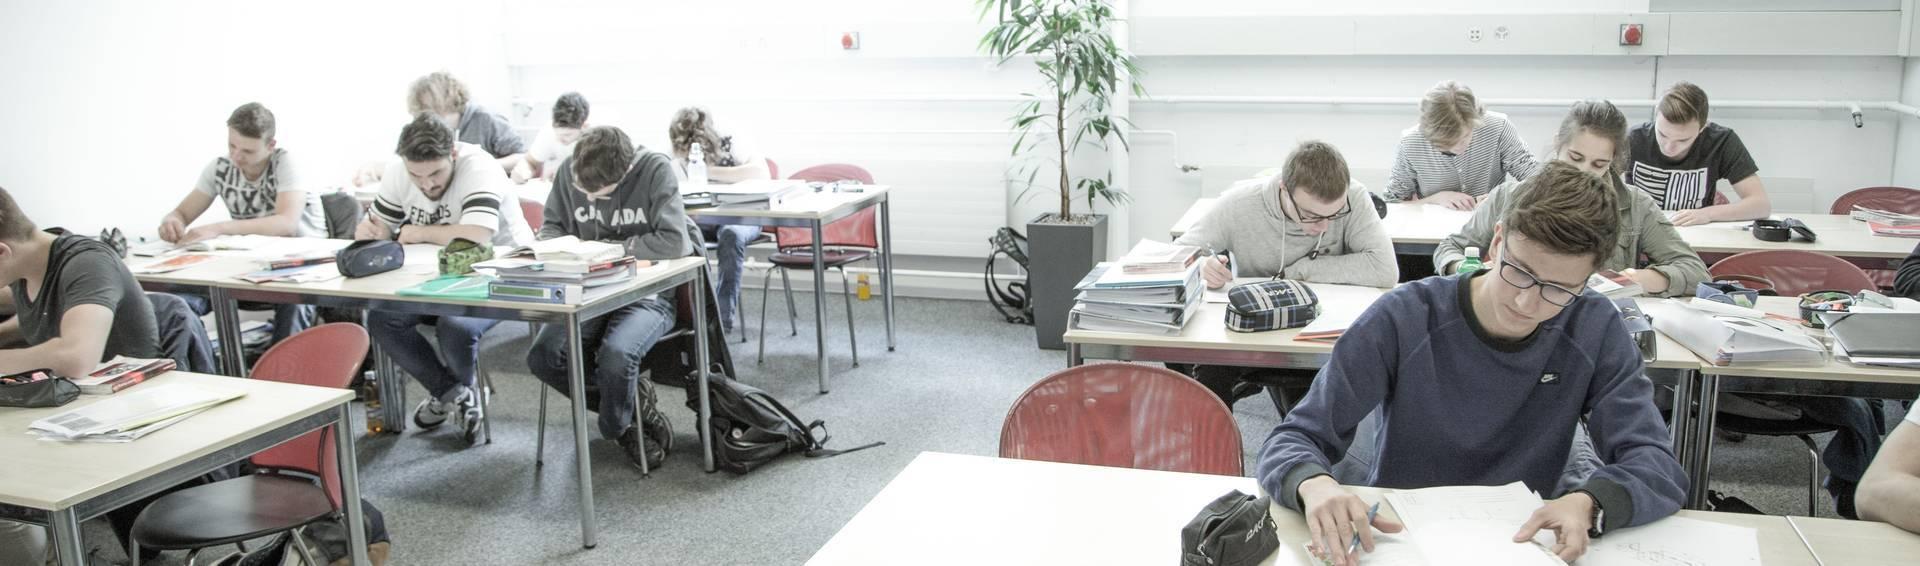 Konstrukteur/in EFZ: BMS-Vorkurs BMV